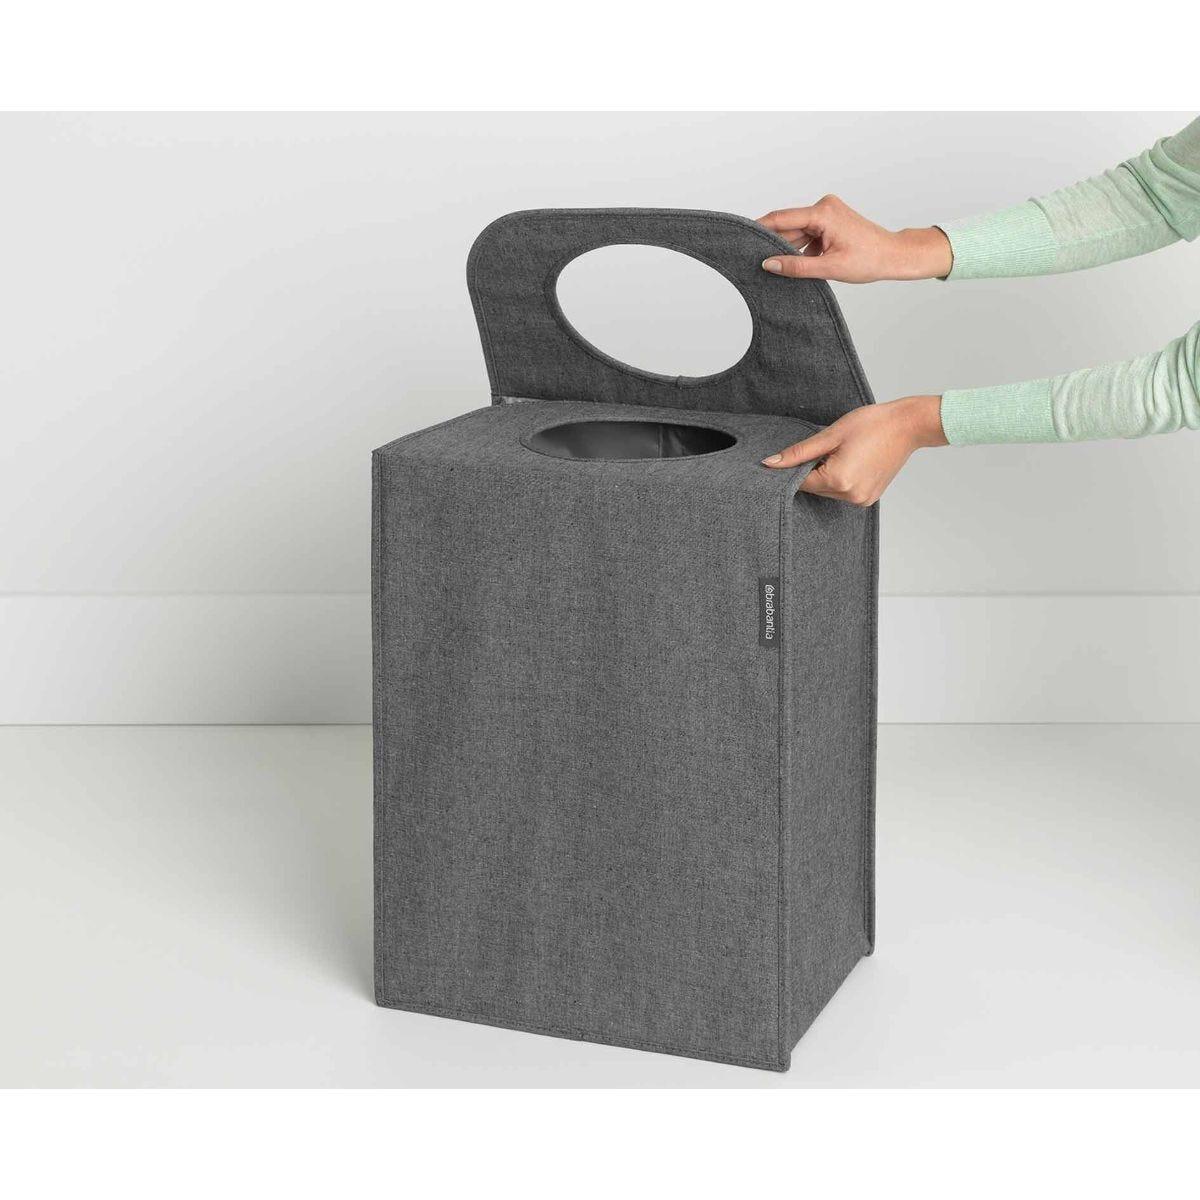 Brabantia Rectangular Laundry Bag 55 Litre Charcoal